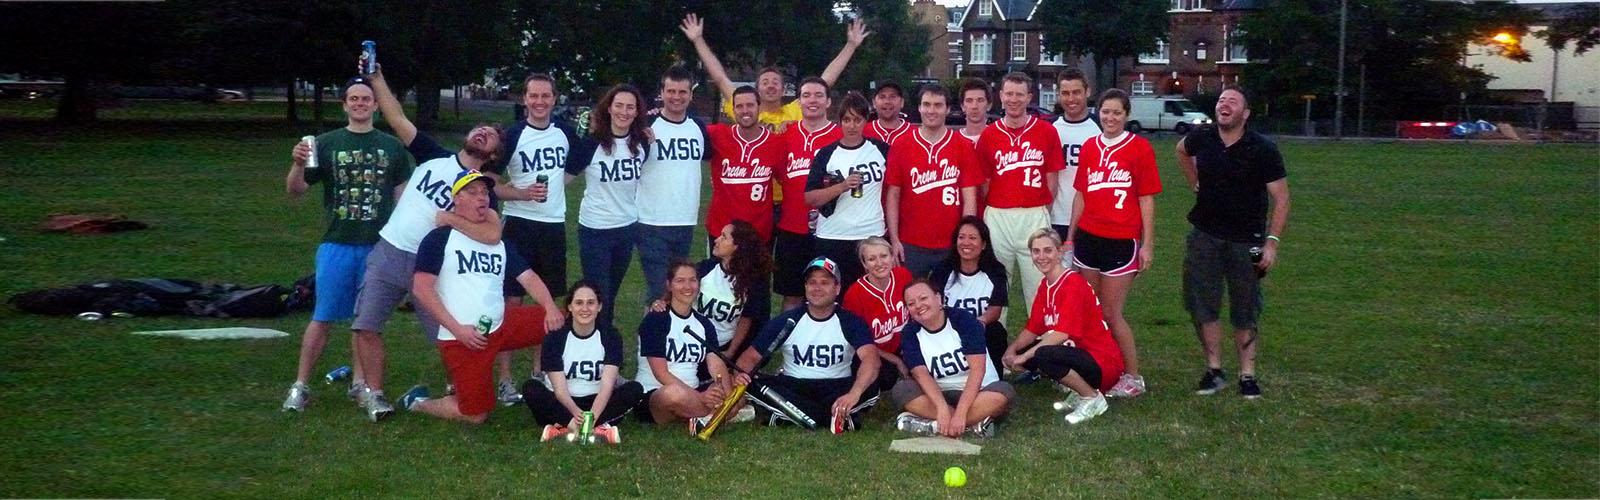 _0011_GOMammoth-Softball-London